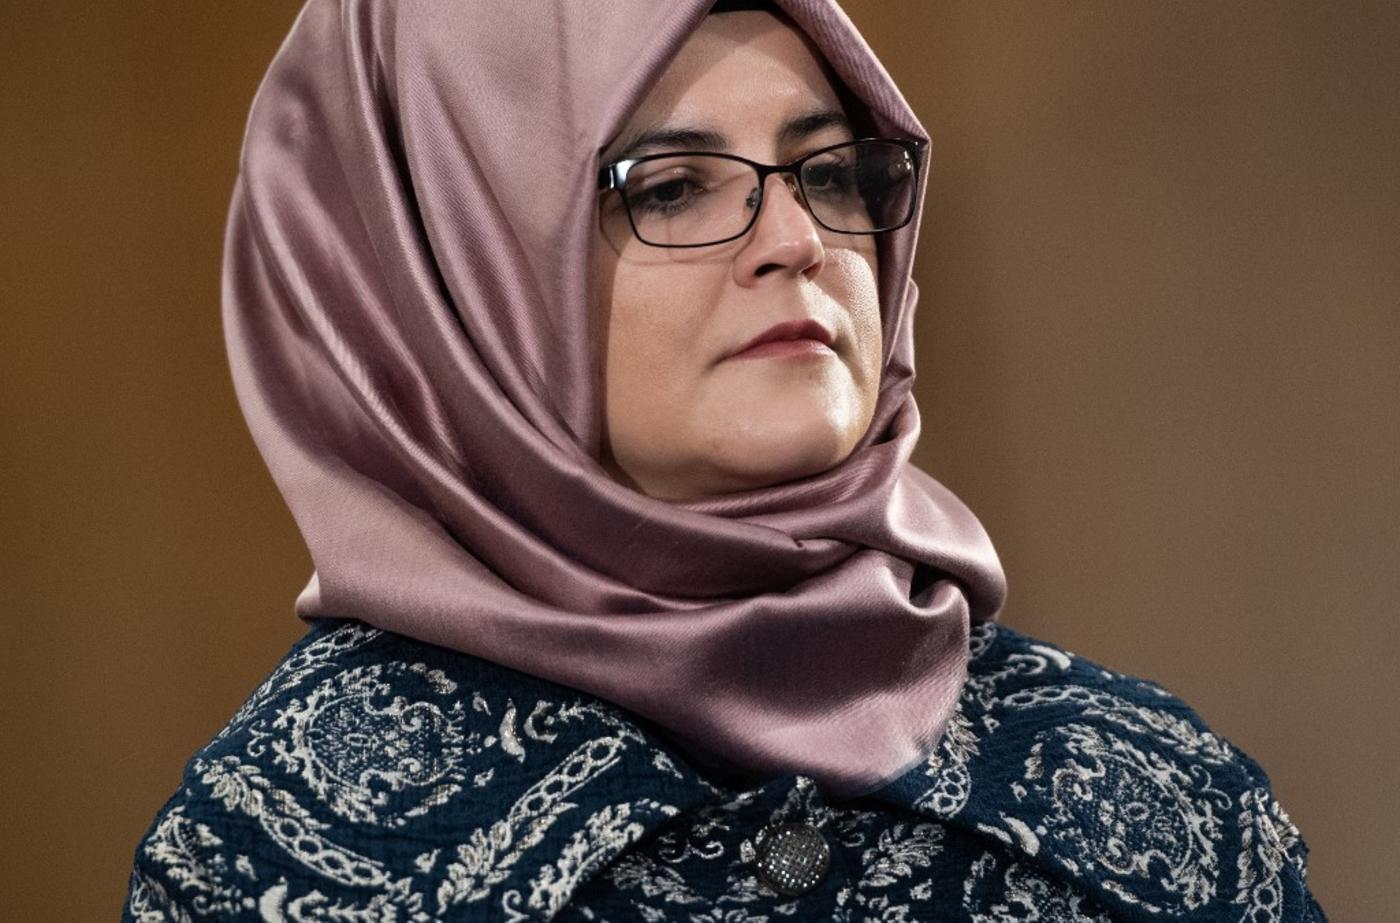 Khashoggi's fiancee sues Saudi Crown Prince over journalist's murder